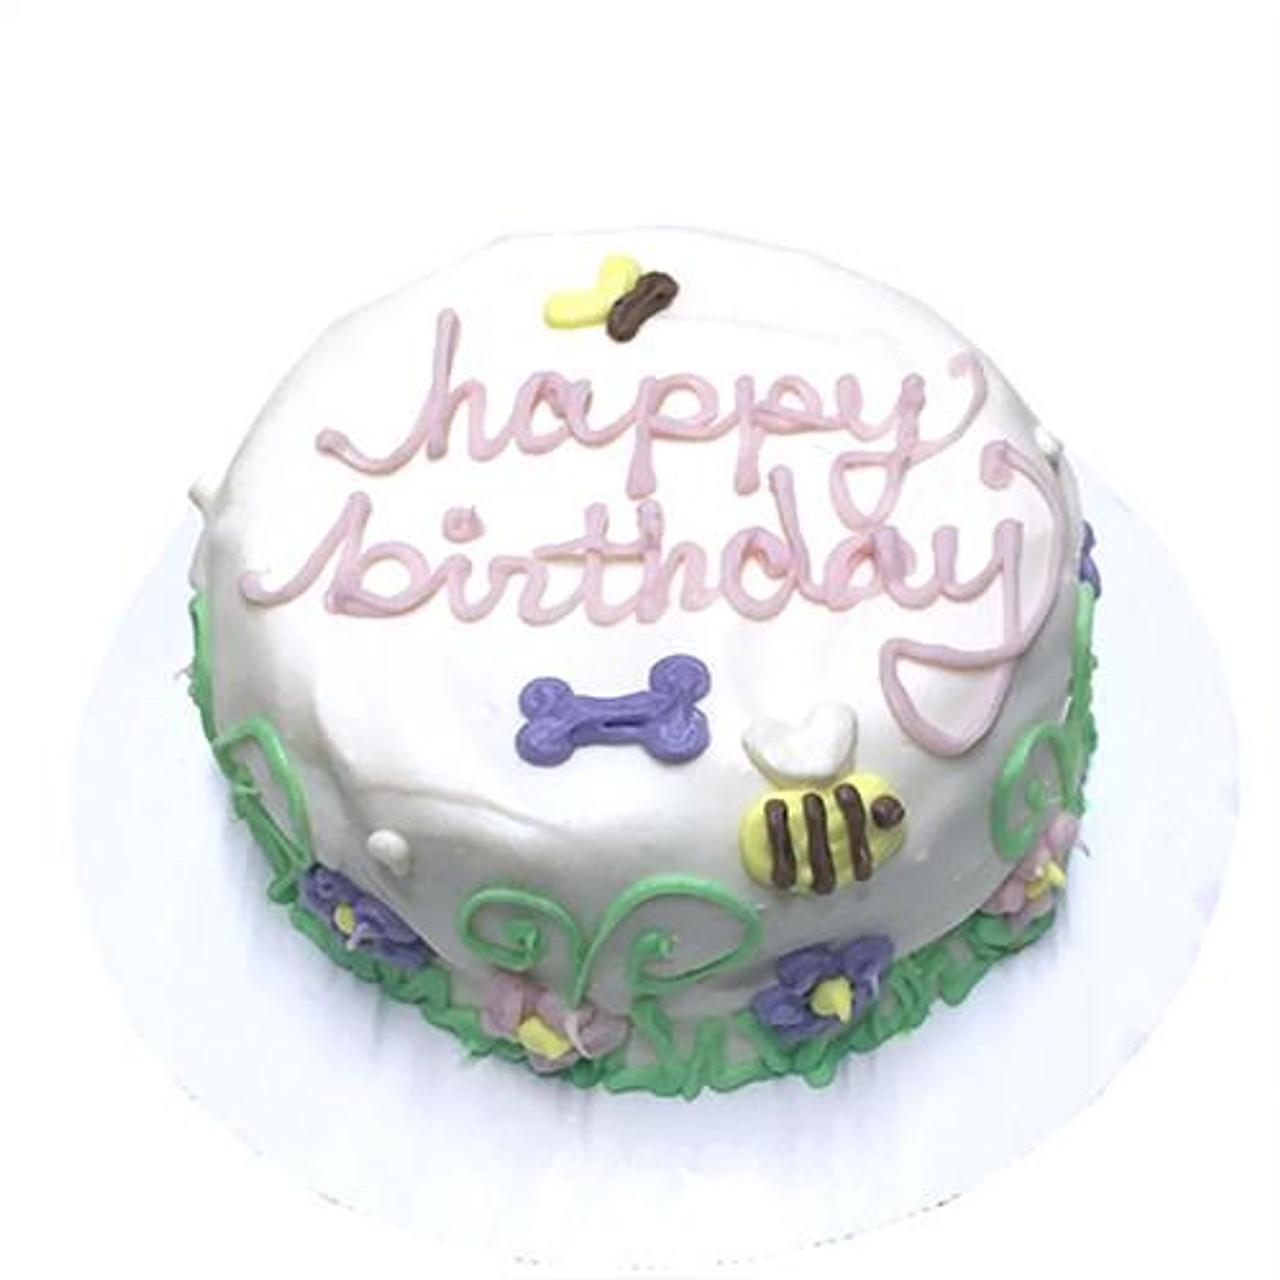 Magnificent Customized Birthday Cakes For Dogs Garden Theme Organic Dog Treats Funny Birthday Cards Online Benoljebrpdamsfinfo